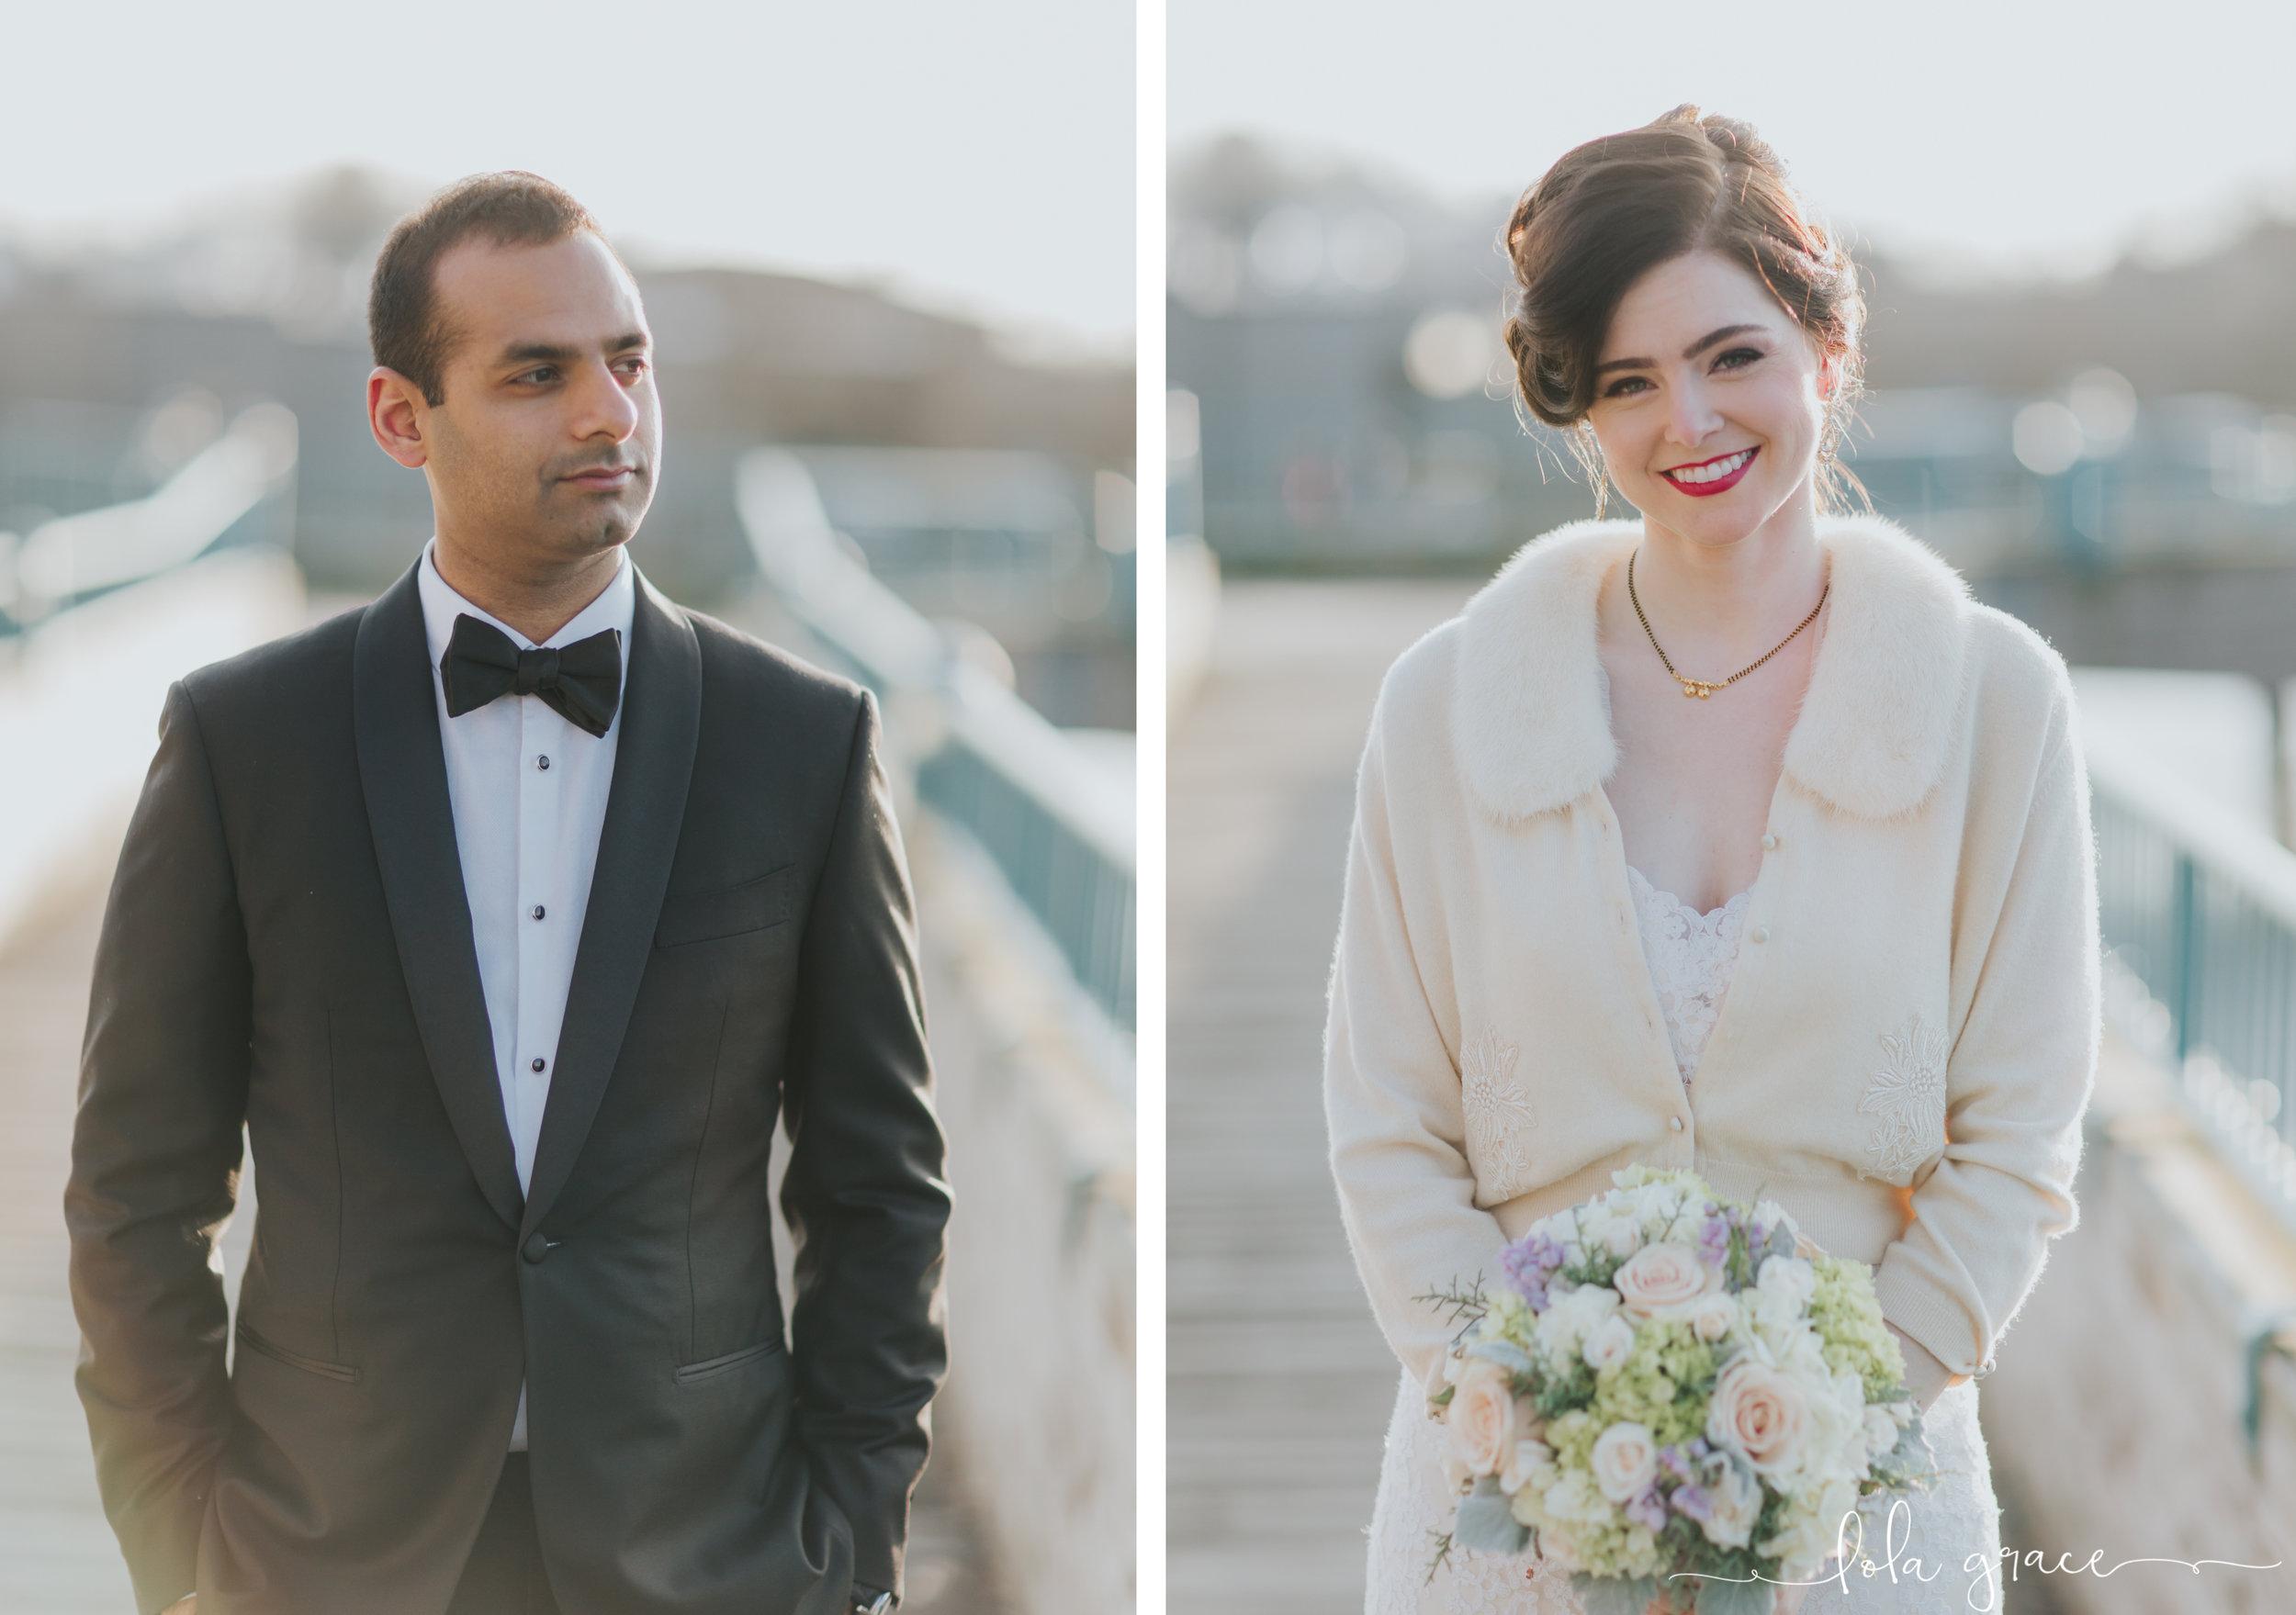 lola-grace-photography-erin-nik-brighton-mi-wedding-14.jpg